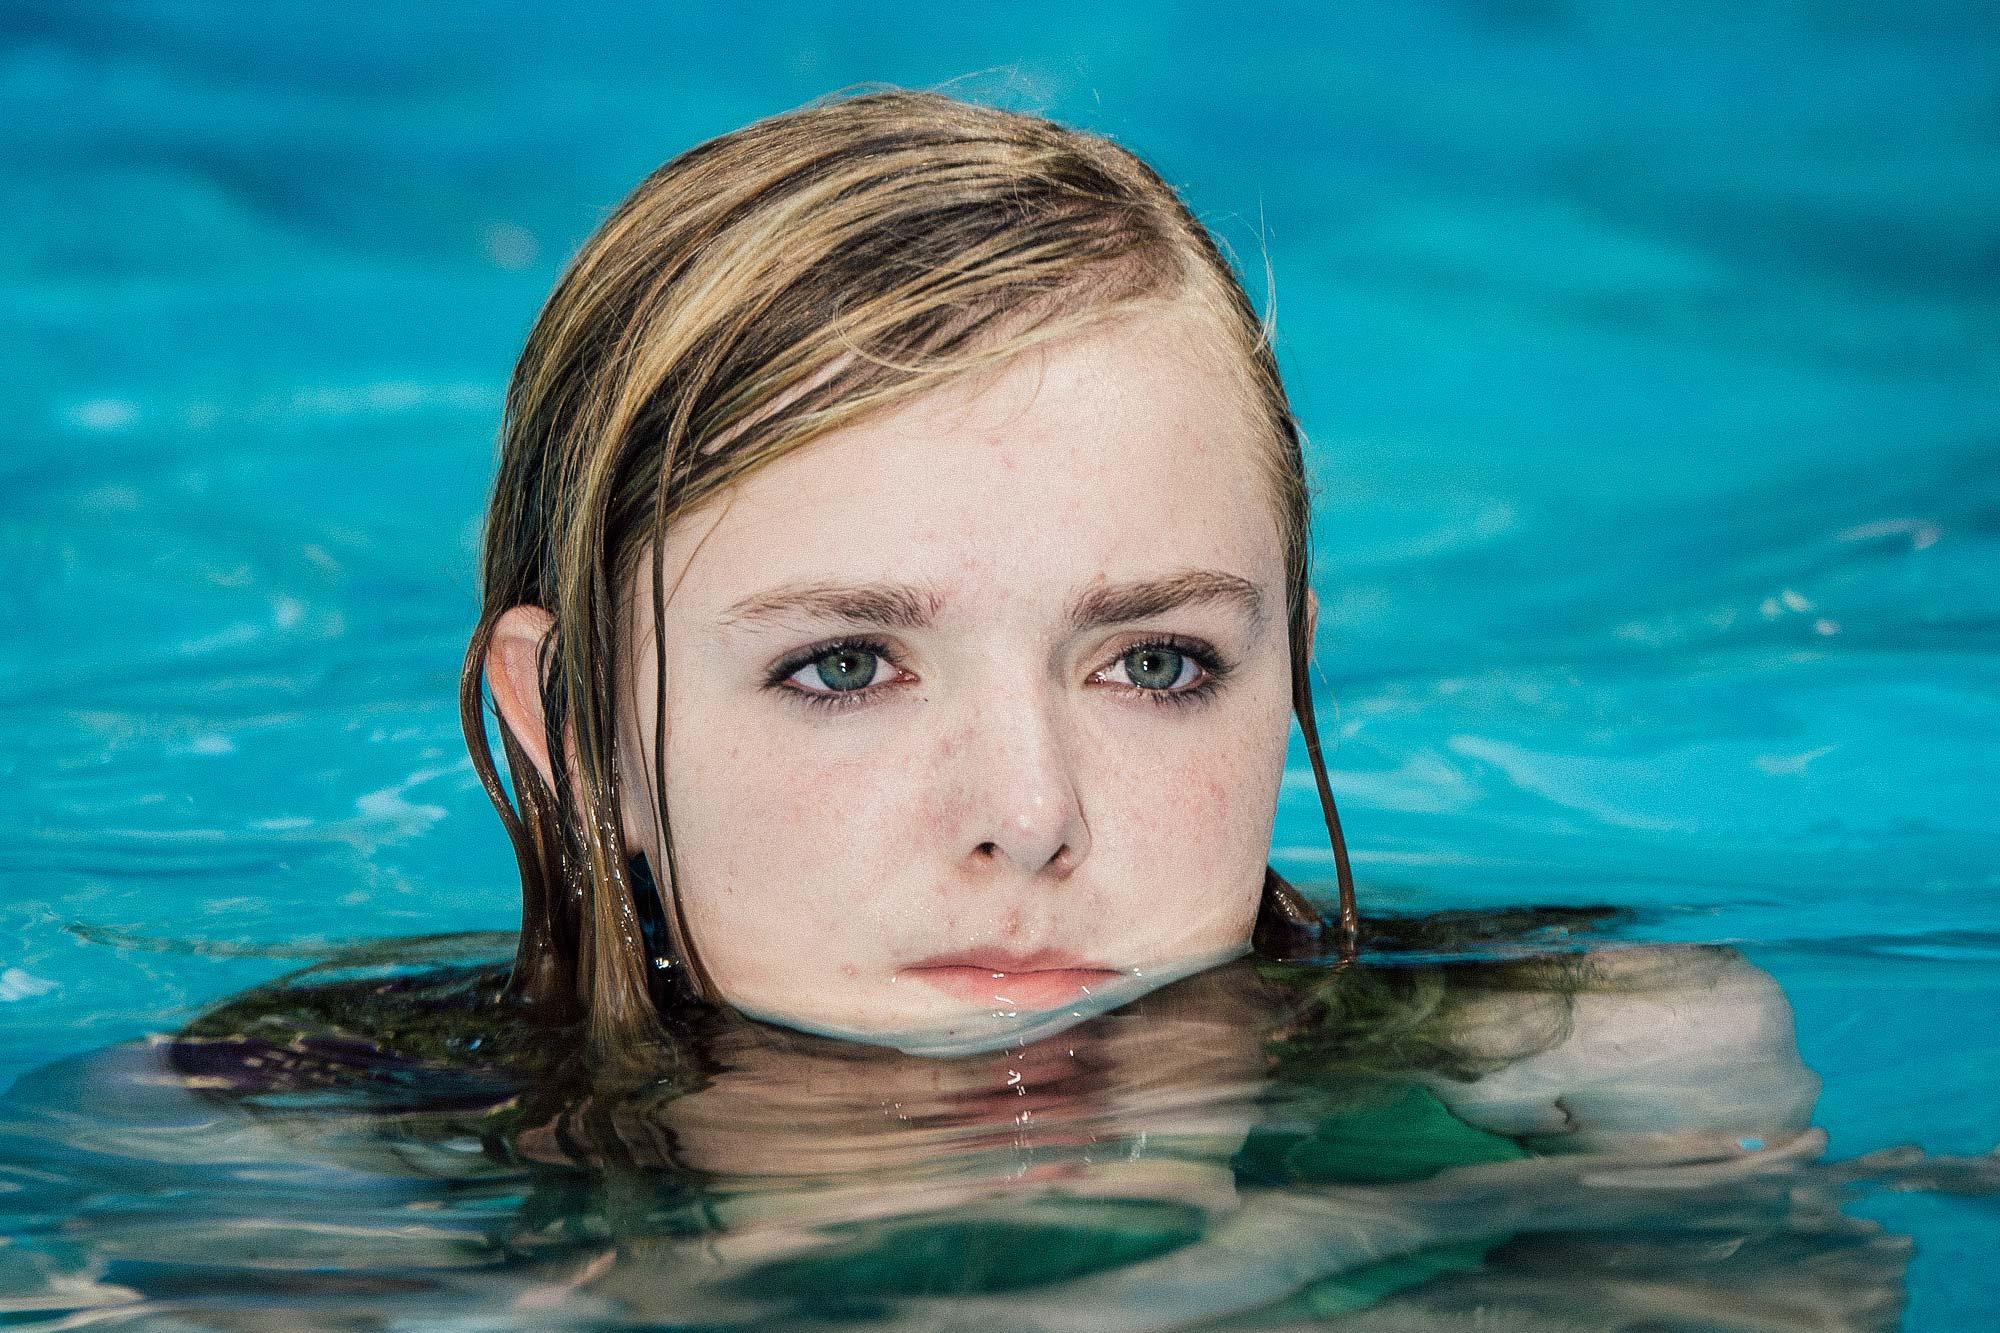 A teenage girl in a swimming pool.